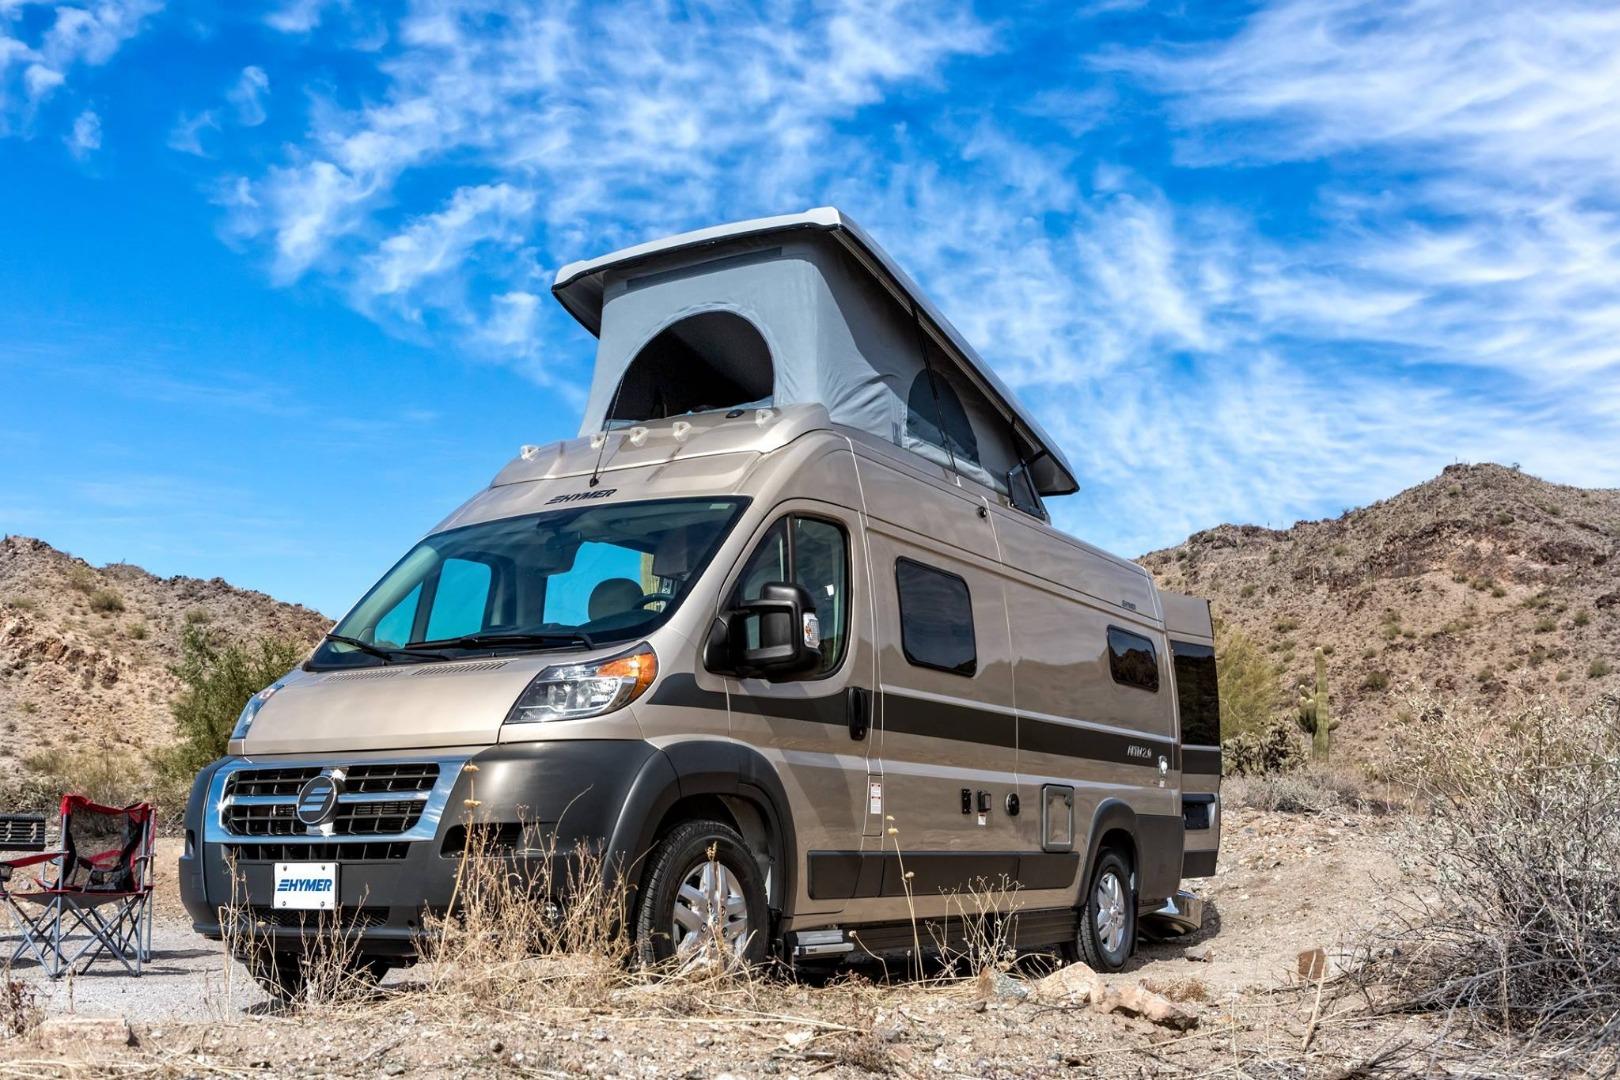 Roomy pop-top camper van sleeps the active, nomadic family of 5